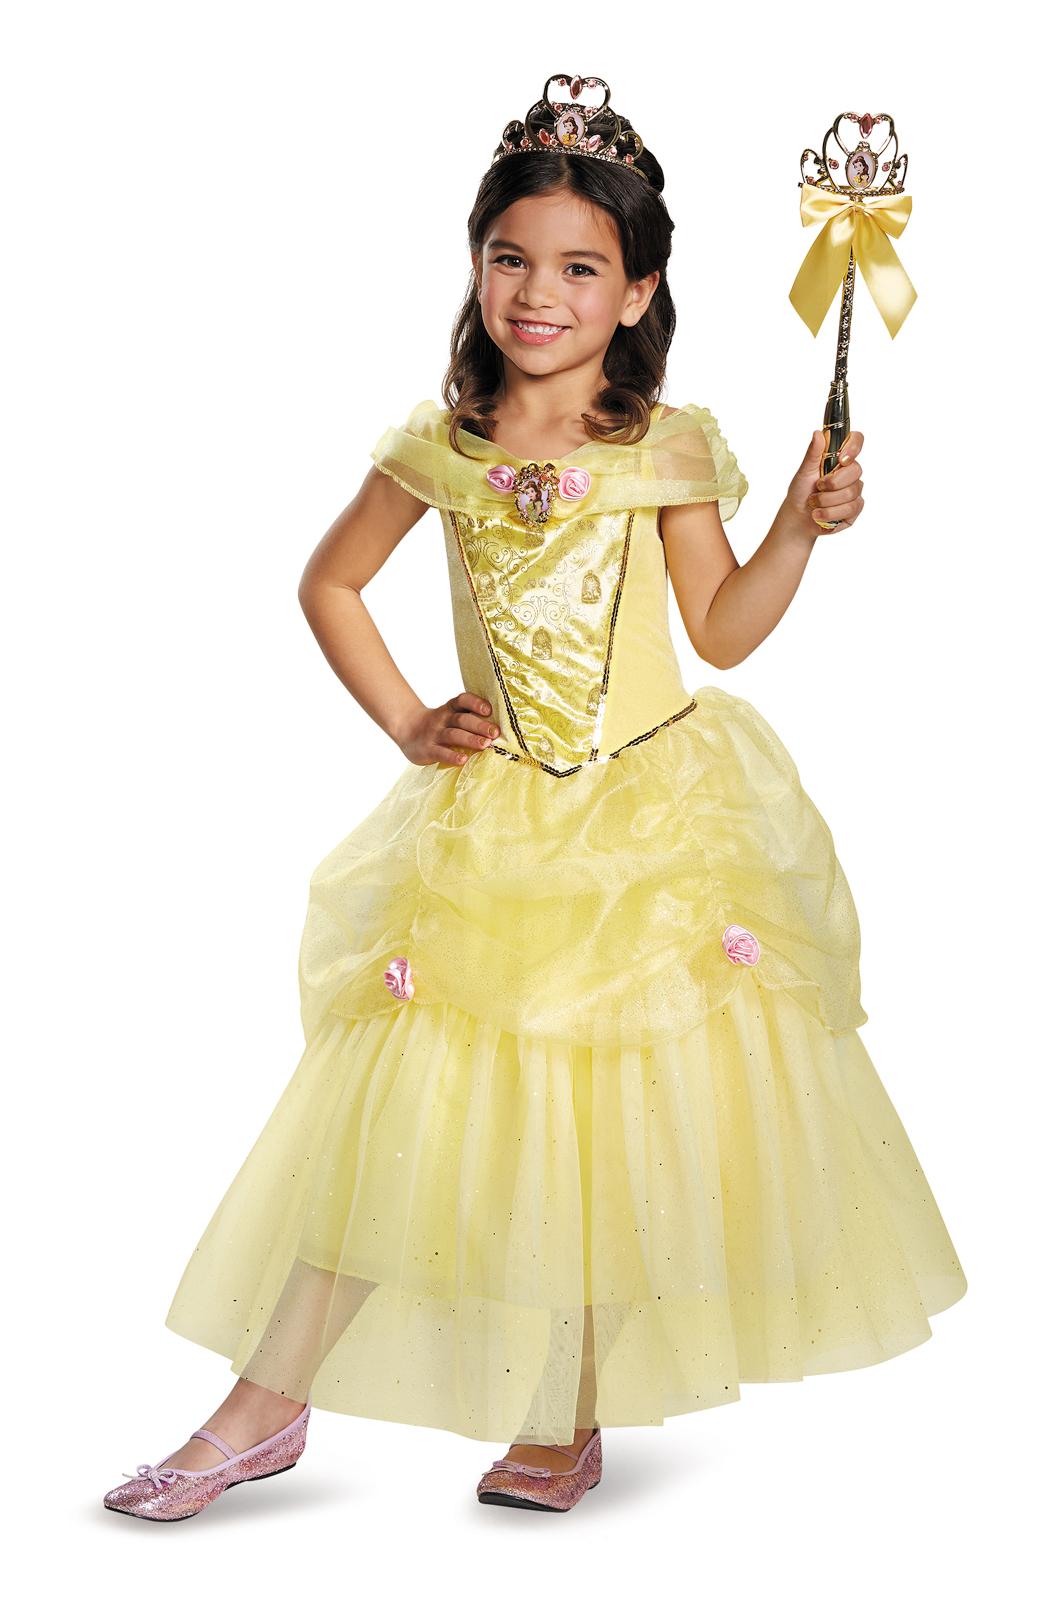 Disney Belle Deluxe Sparkle Toddler Child Costume